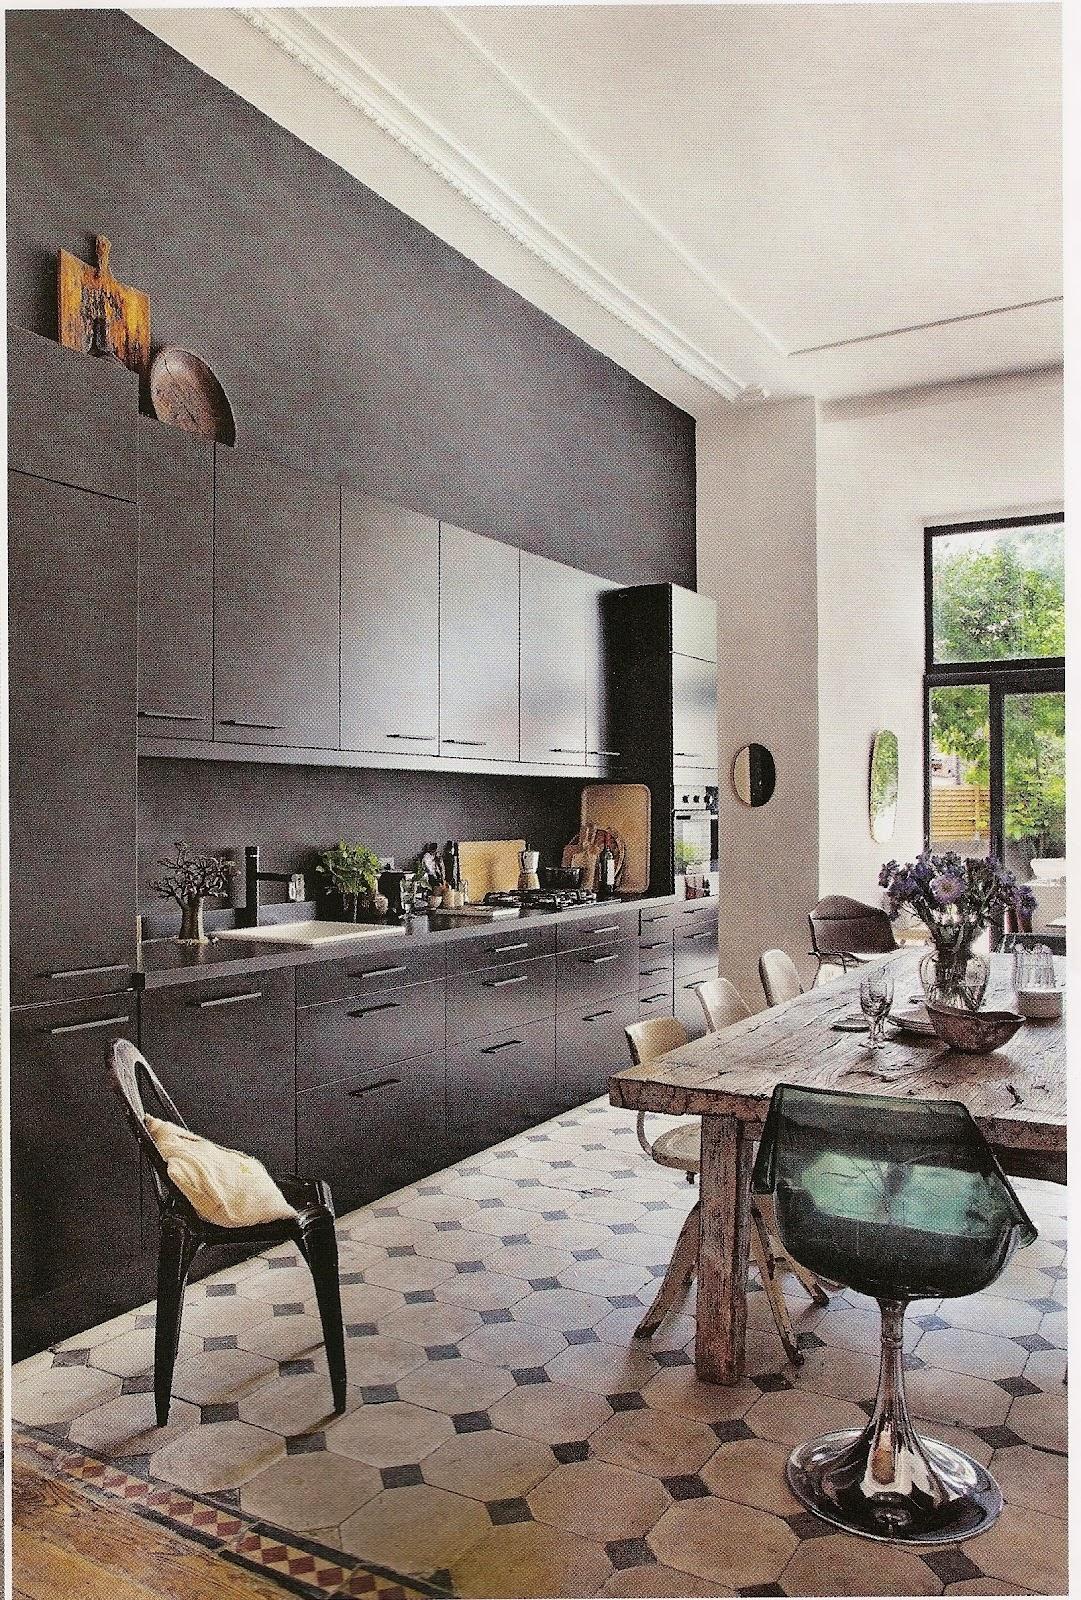 Decor Inspiration Colorful Kitchens That Work: Seeking Inspiration: Kitchens